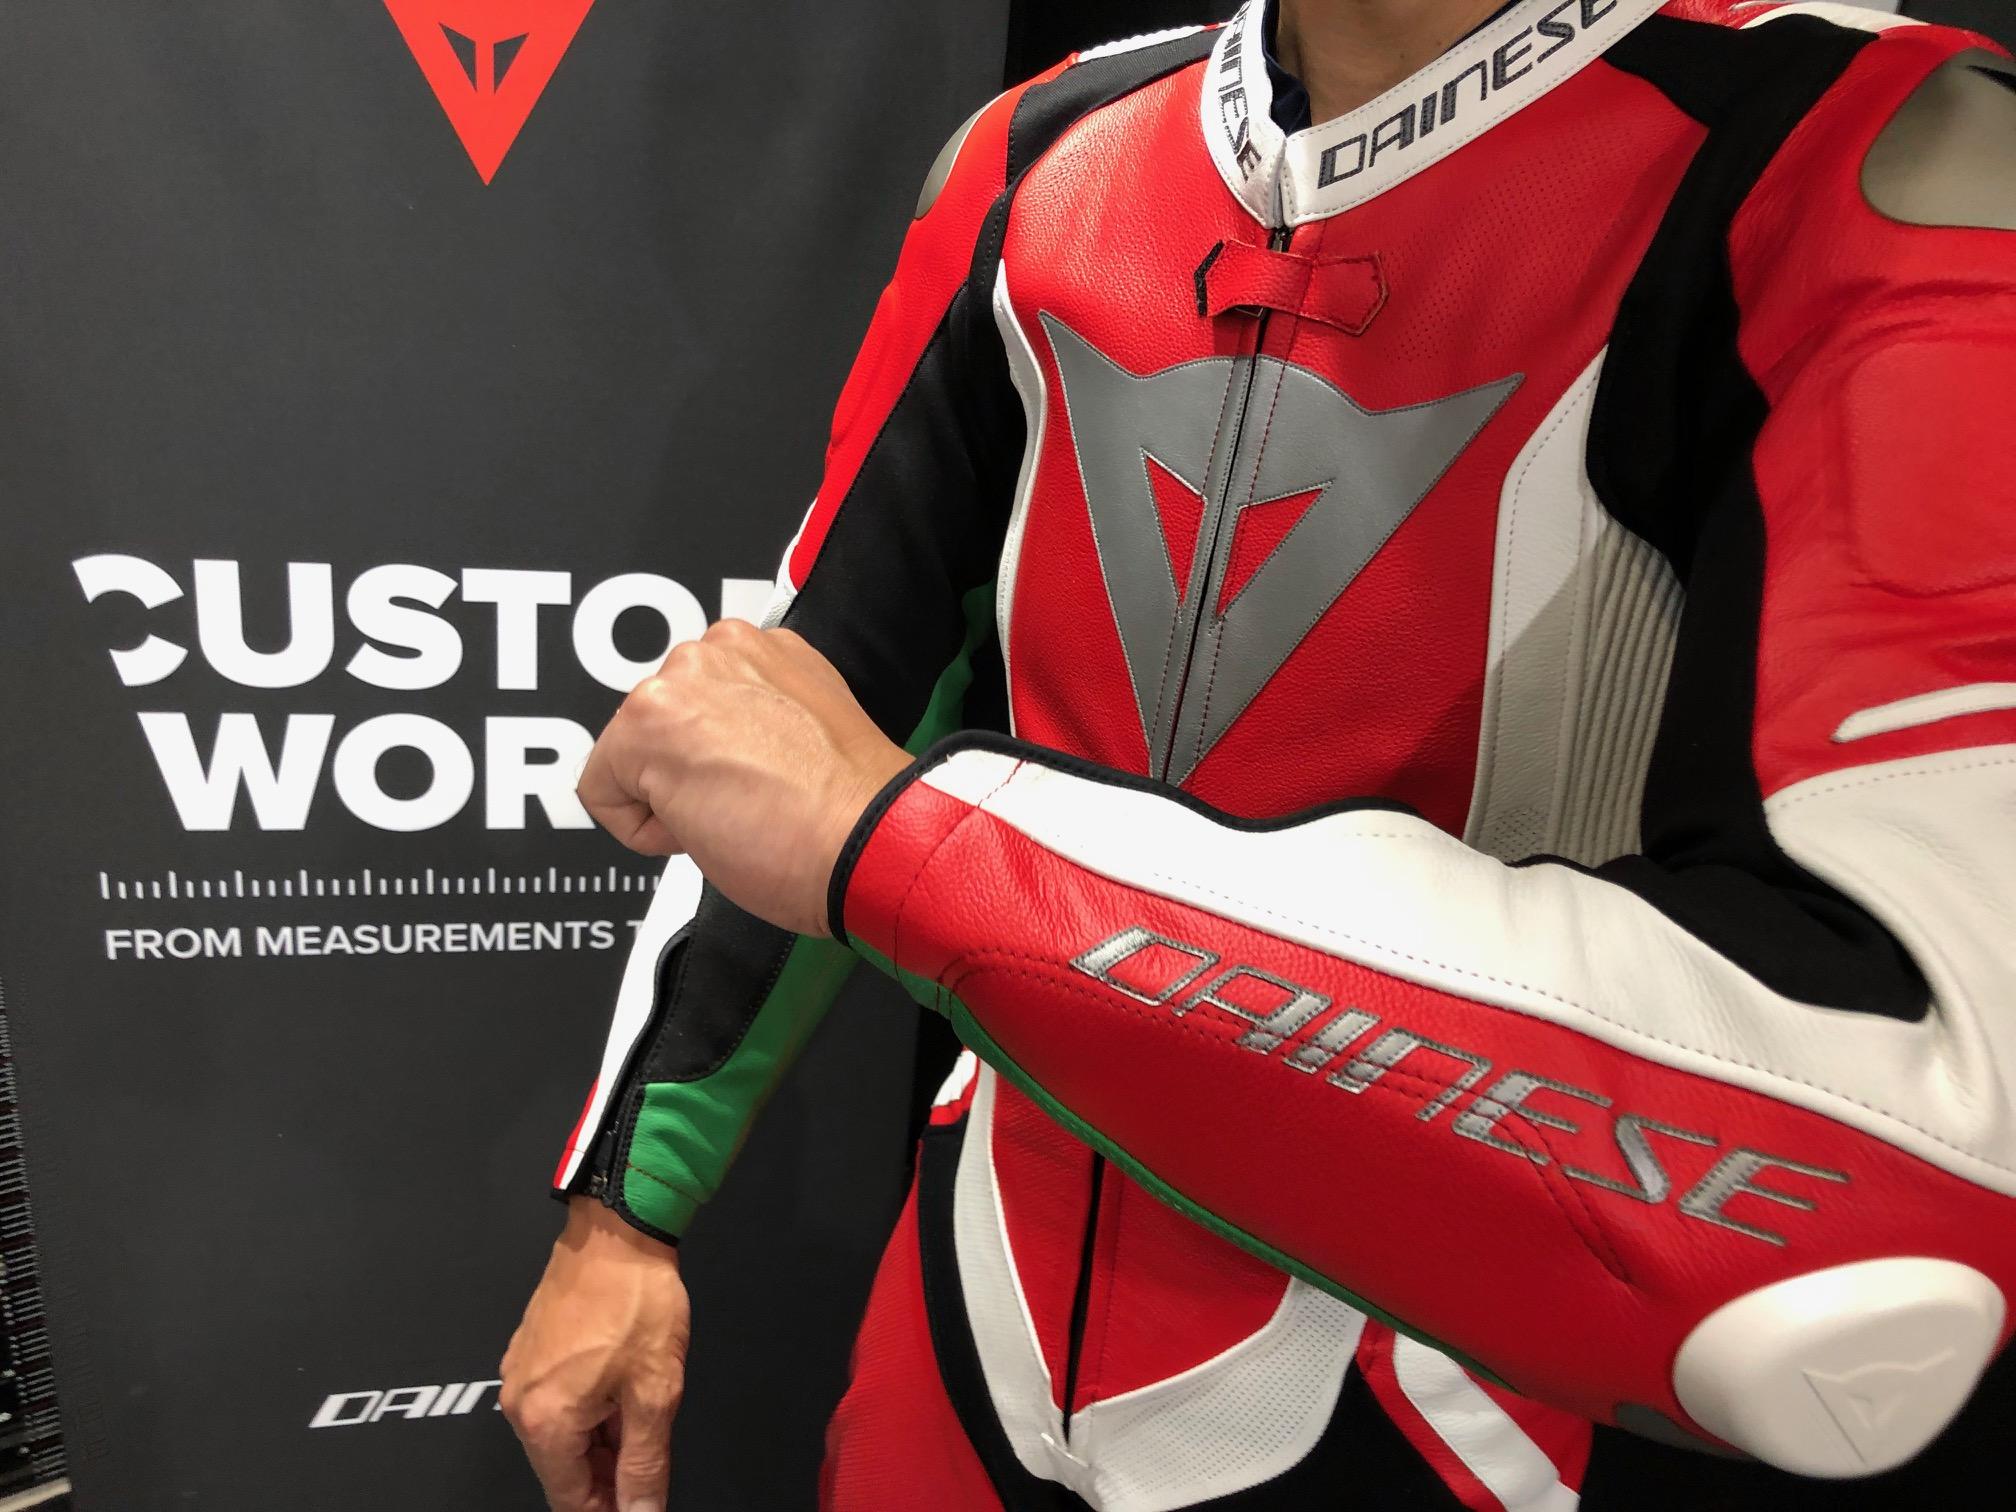 【CUSTOM WORKS】オーダーメイドのレーシングスーツのご紹介